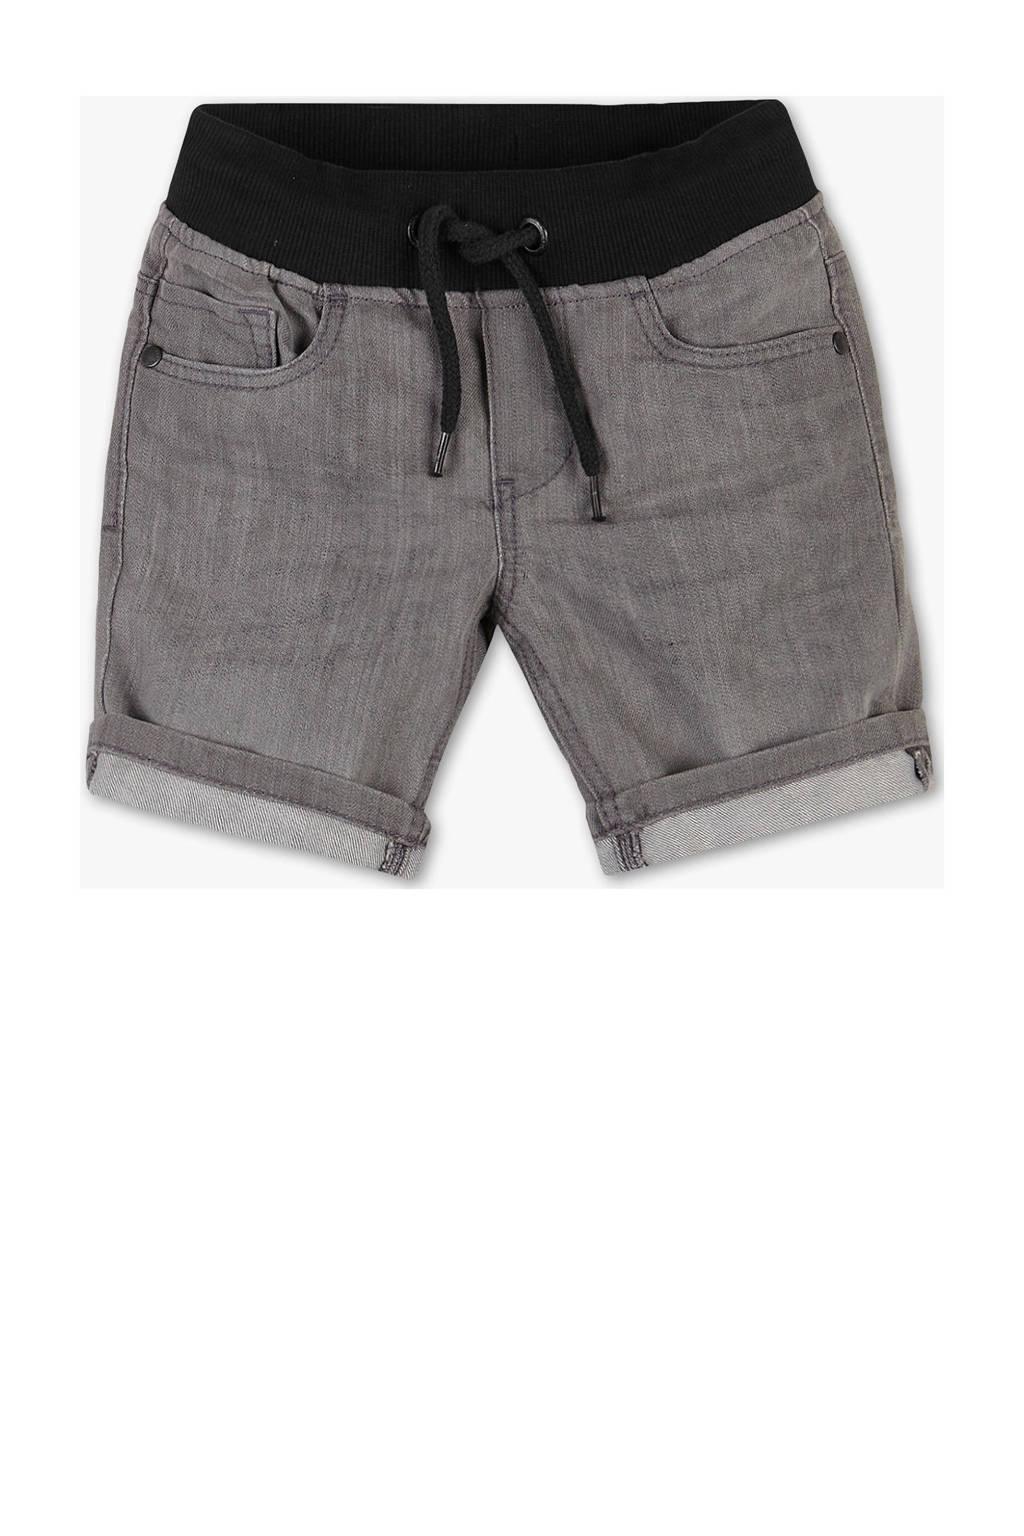 C&A Palomino jeans bermuda grijs, Grijs